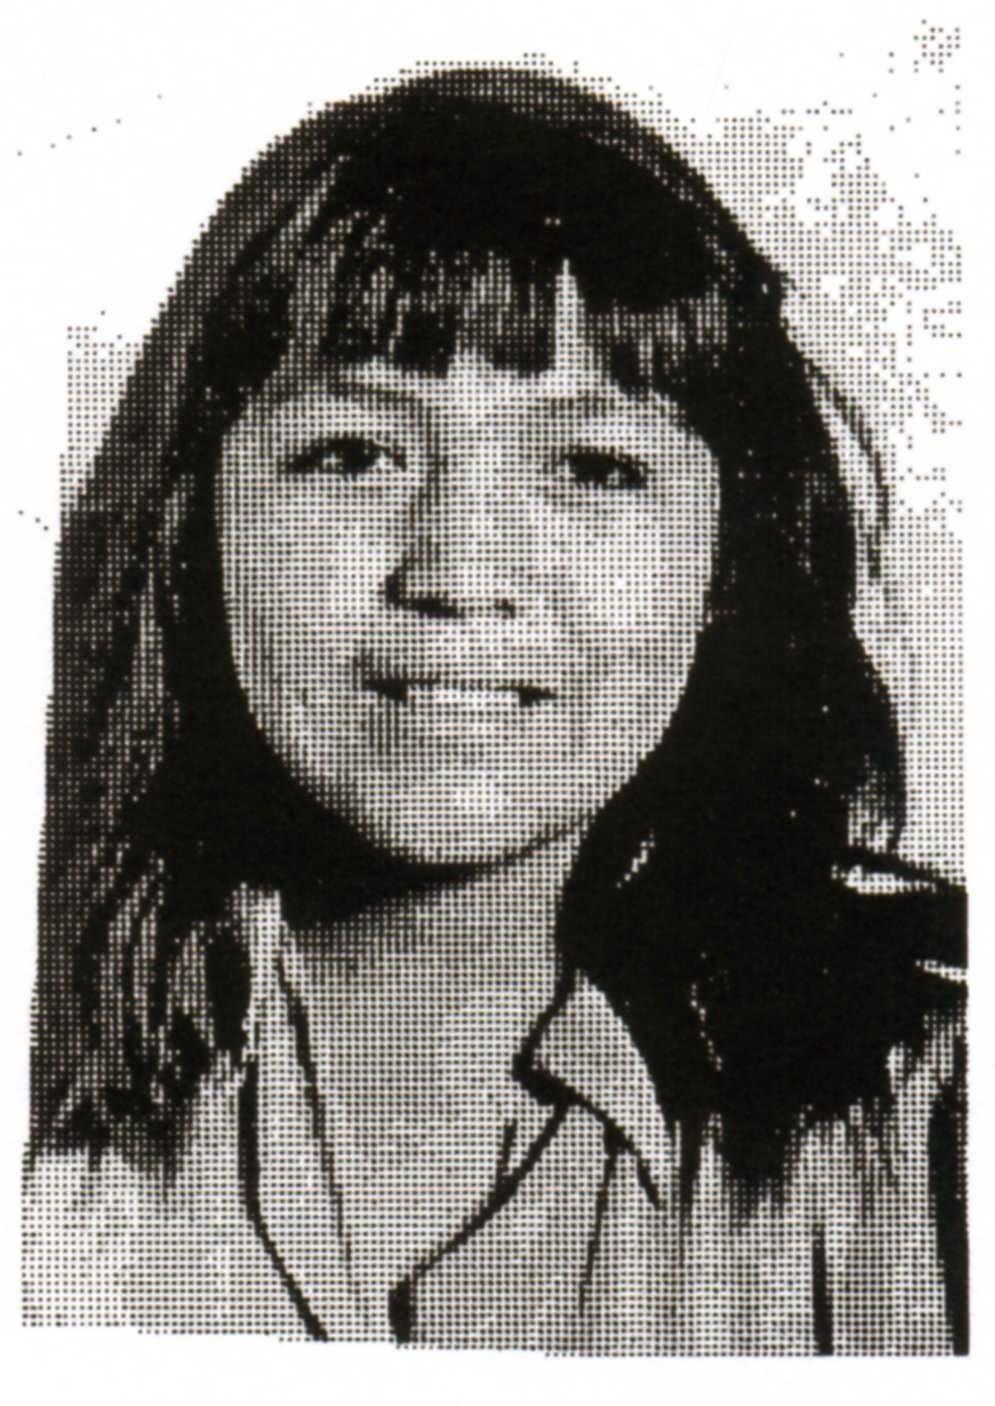 Forum on this topic: Rosalind Bennett, bobbie-eakes-born-july-25-1961-age/